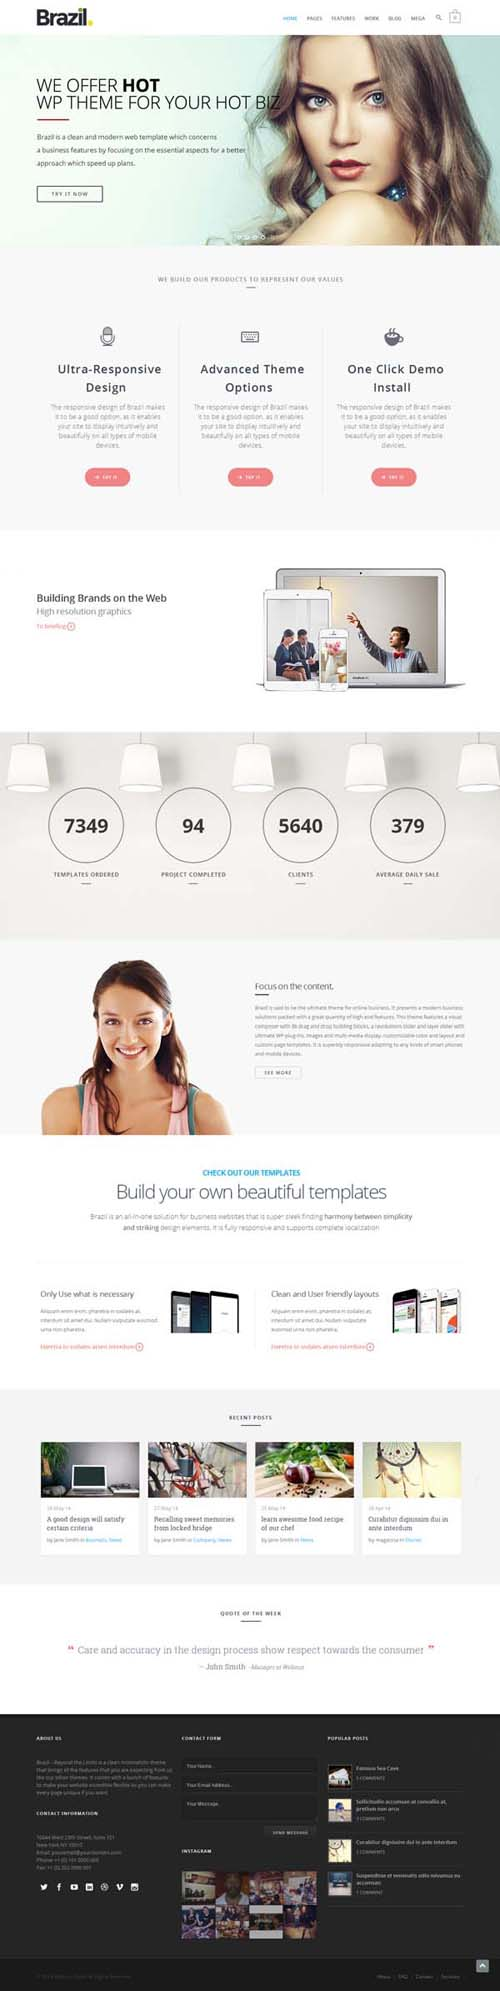 Brazil - WordPress Theme